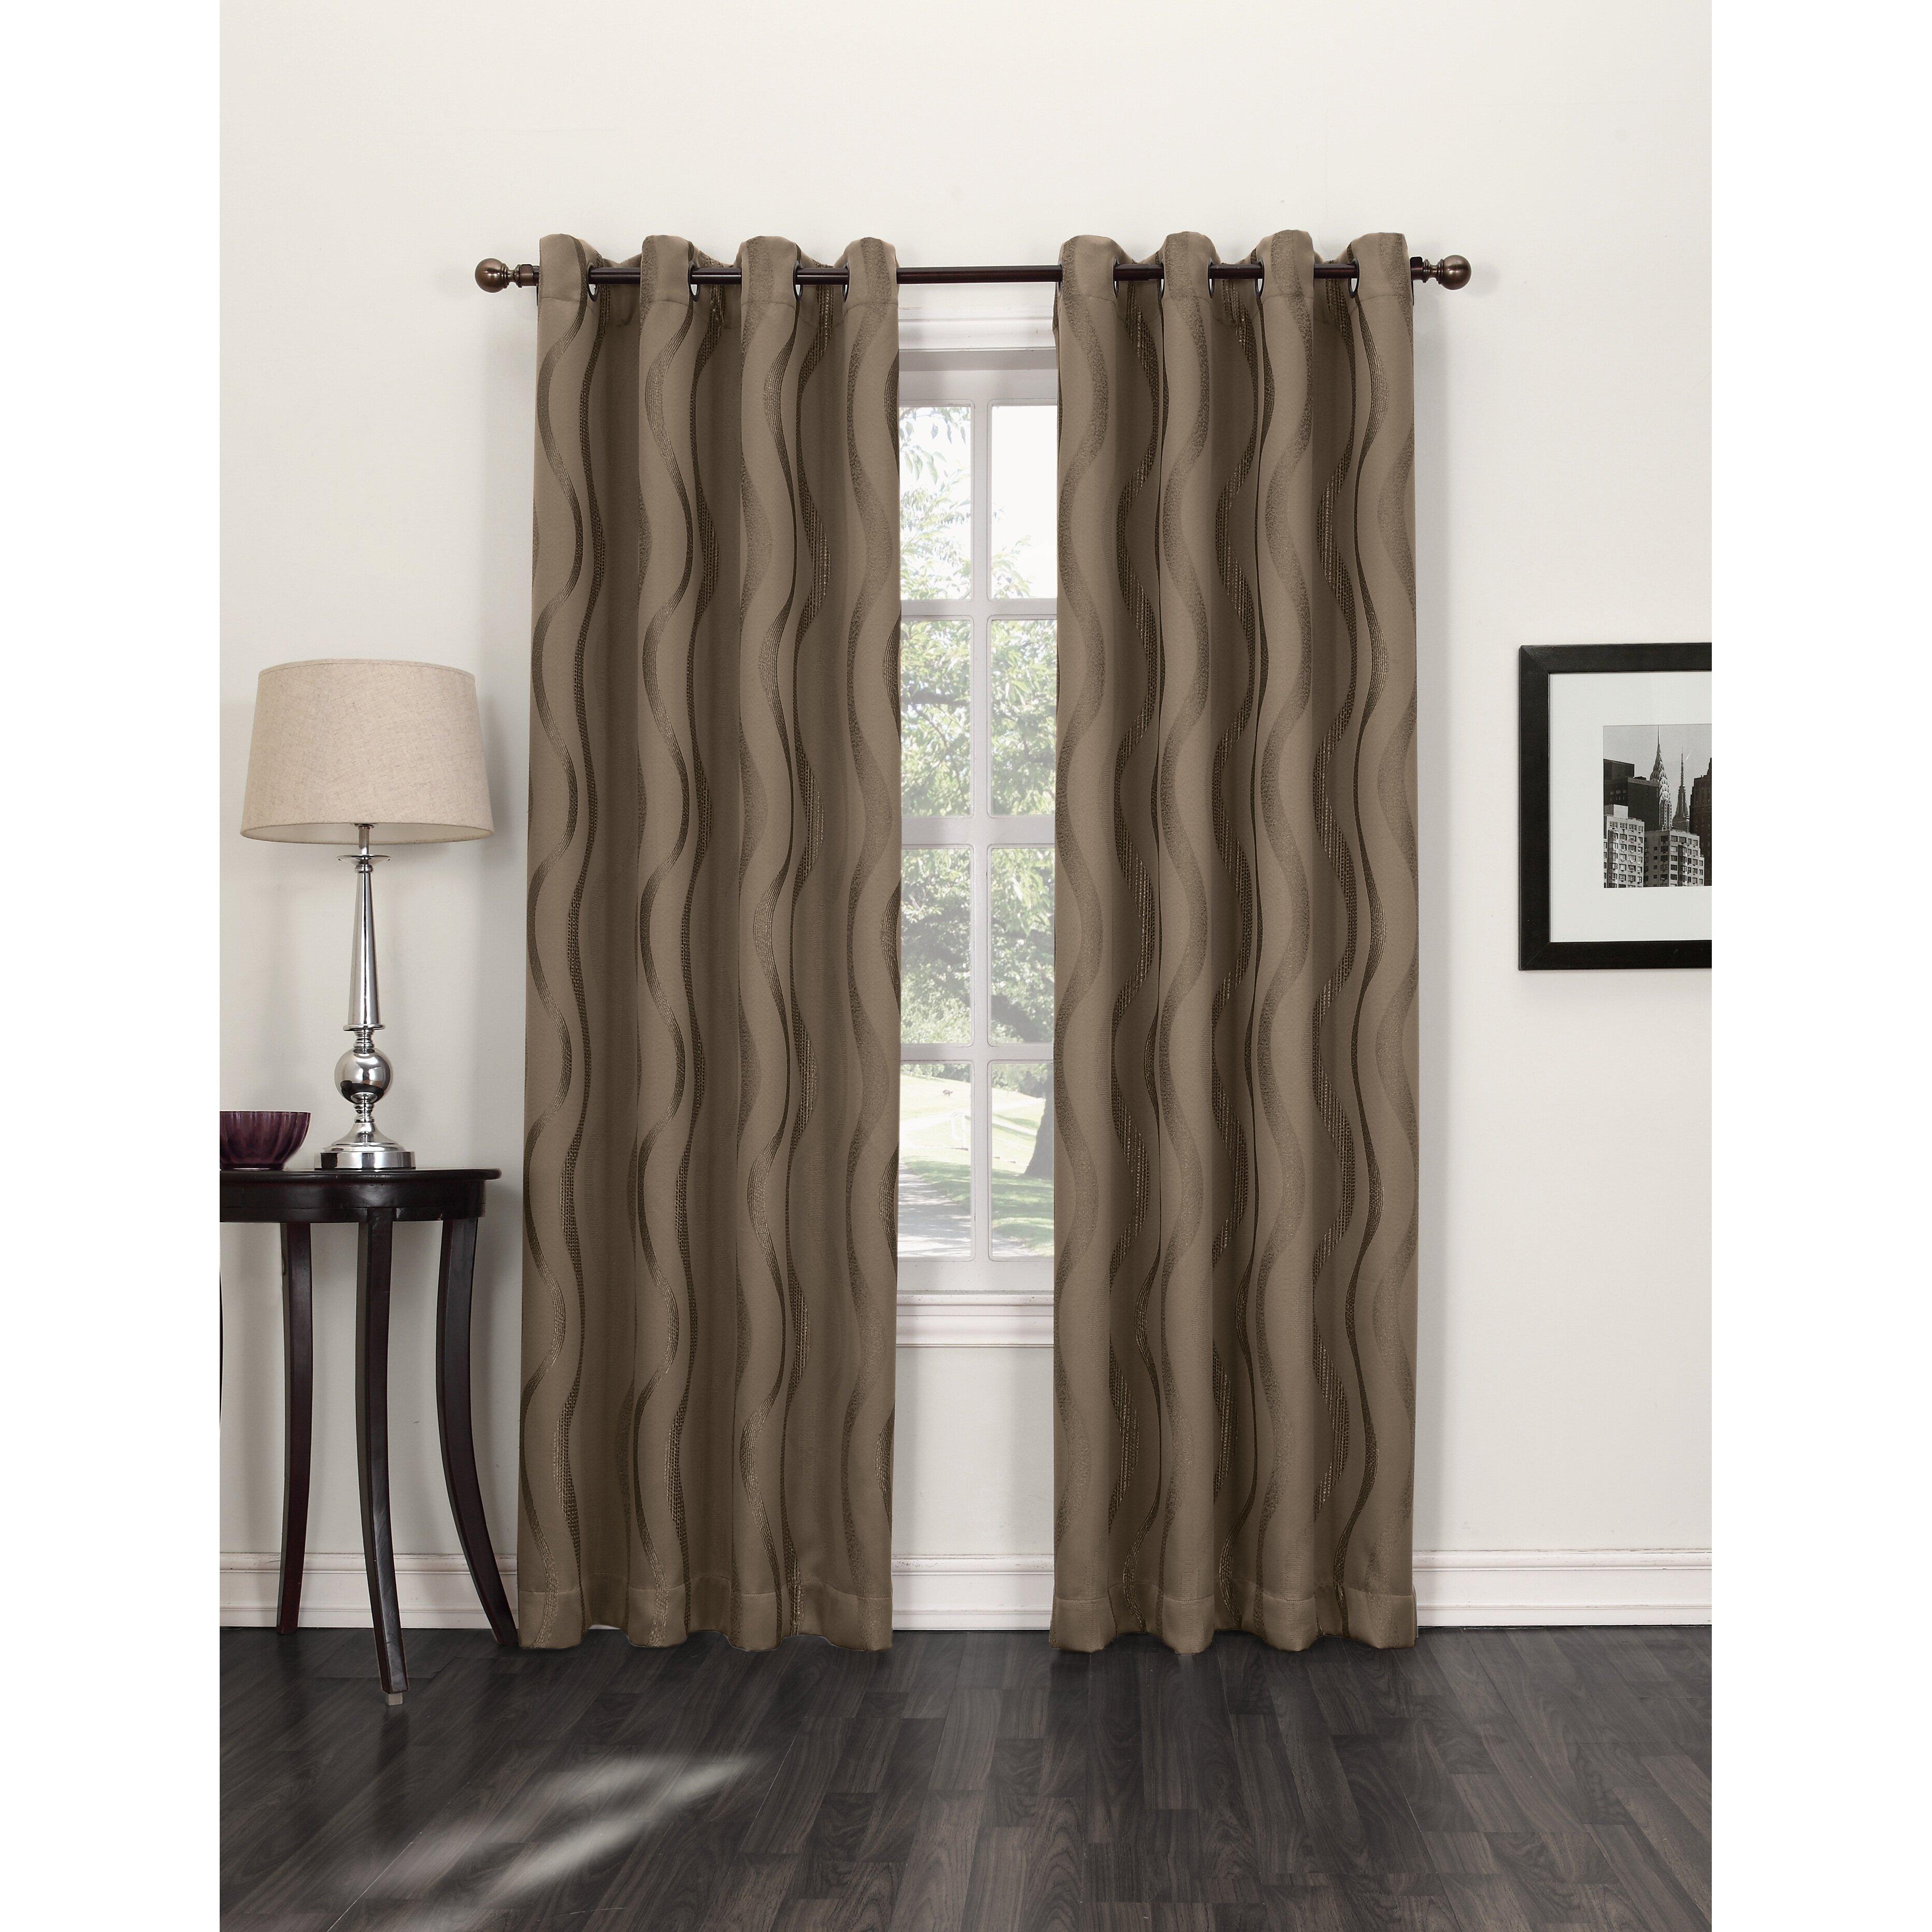 Short Length Bedroom Curtains Geometric Curtains Drapes Youll Love Wayfair